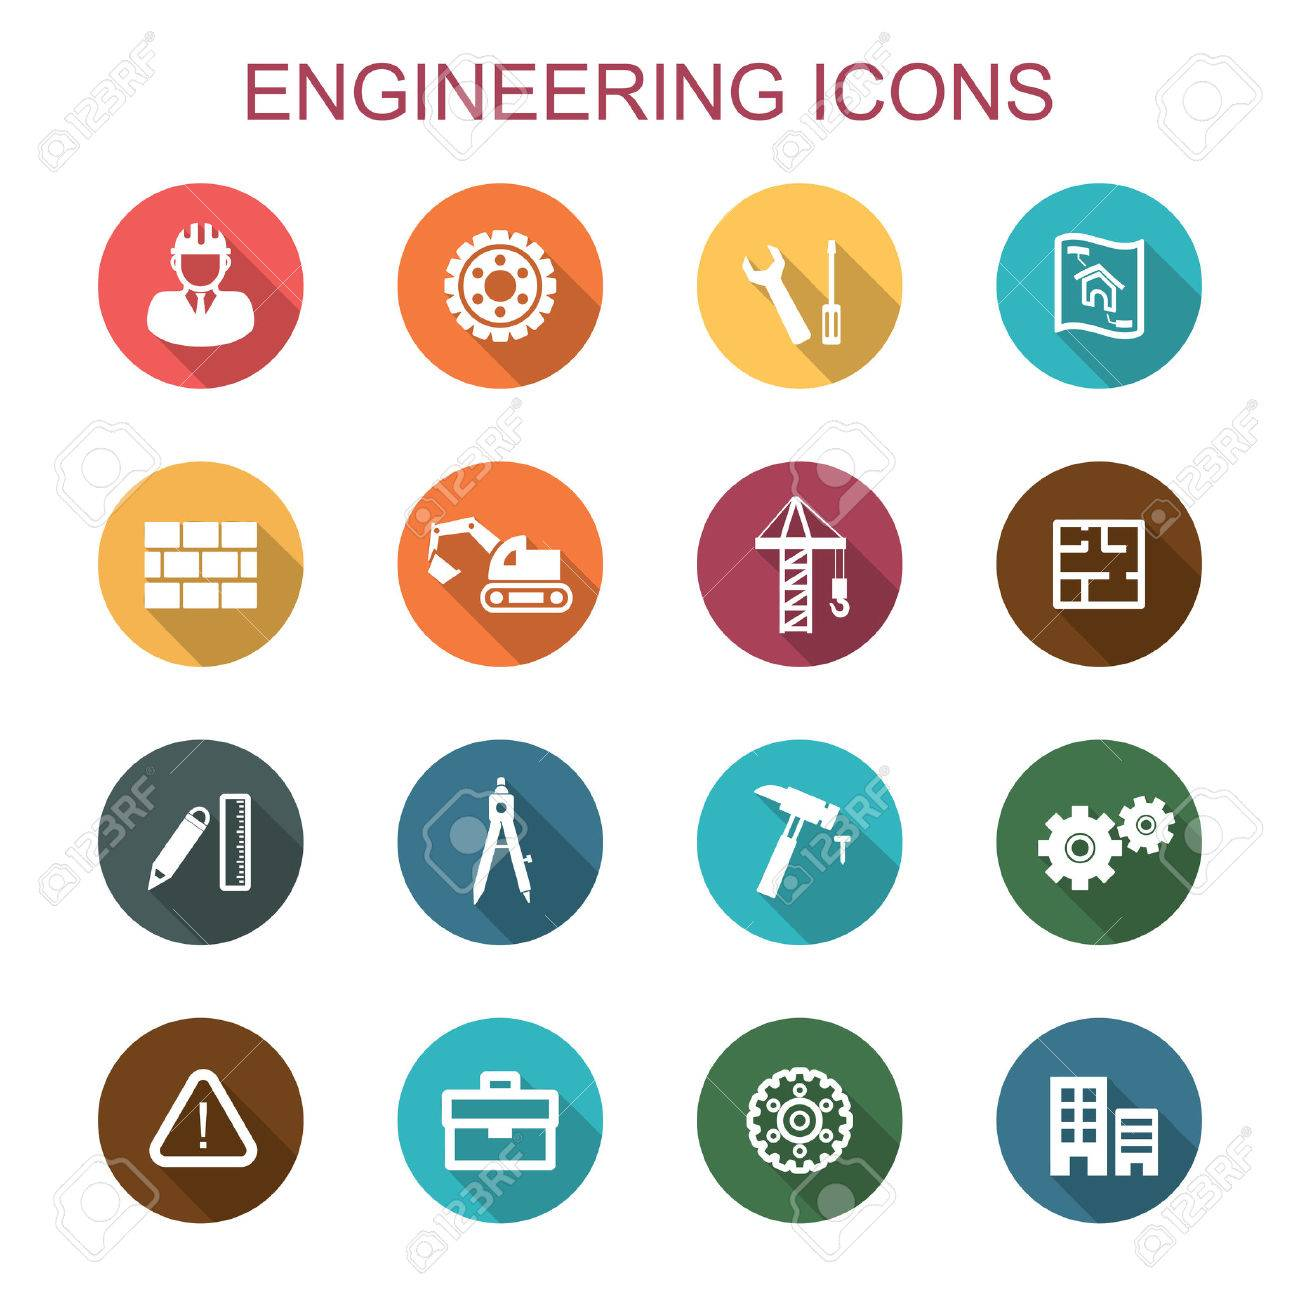 Engineering Long Shadow Icons Flat Vector Symbols Royalty Free